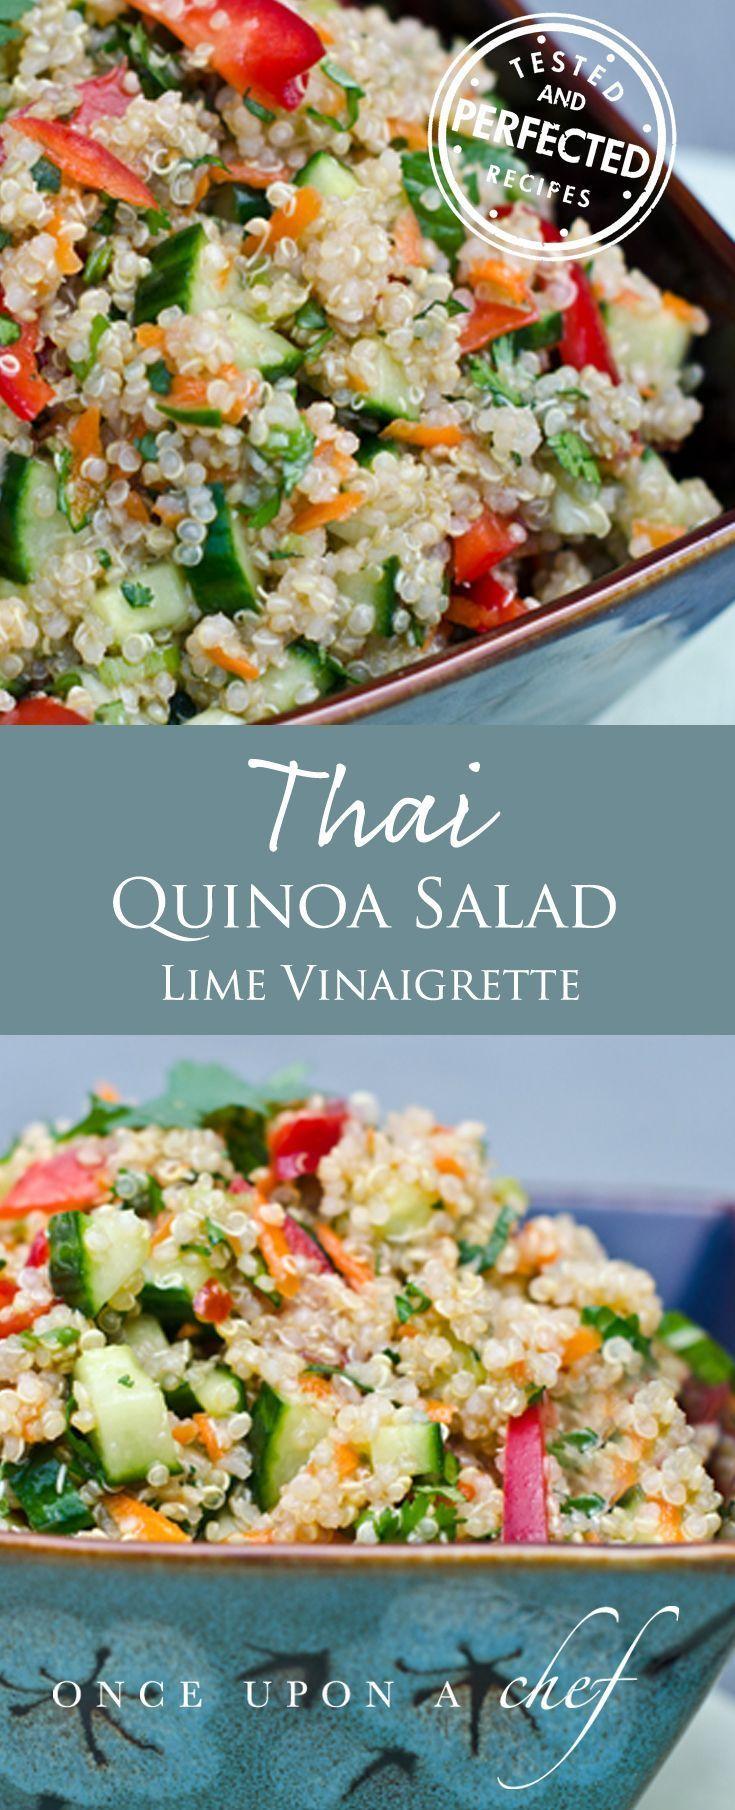 Thai Quinoa Salad with Fresh Herbs and Lime Vinaigrette (scheduled via http://www.tailwindapp.com?utm_source=pinterest&utm_medium=twpin&utm_content=post191959299&utm_campaign=scheduler_attribution)